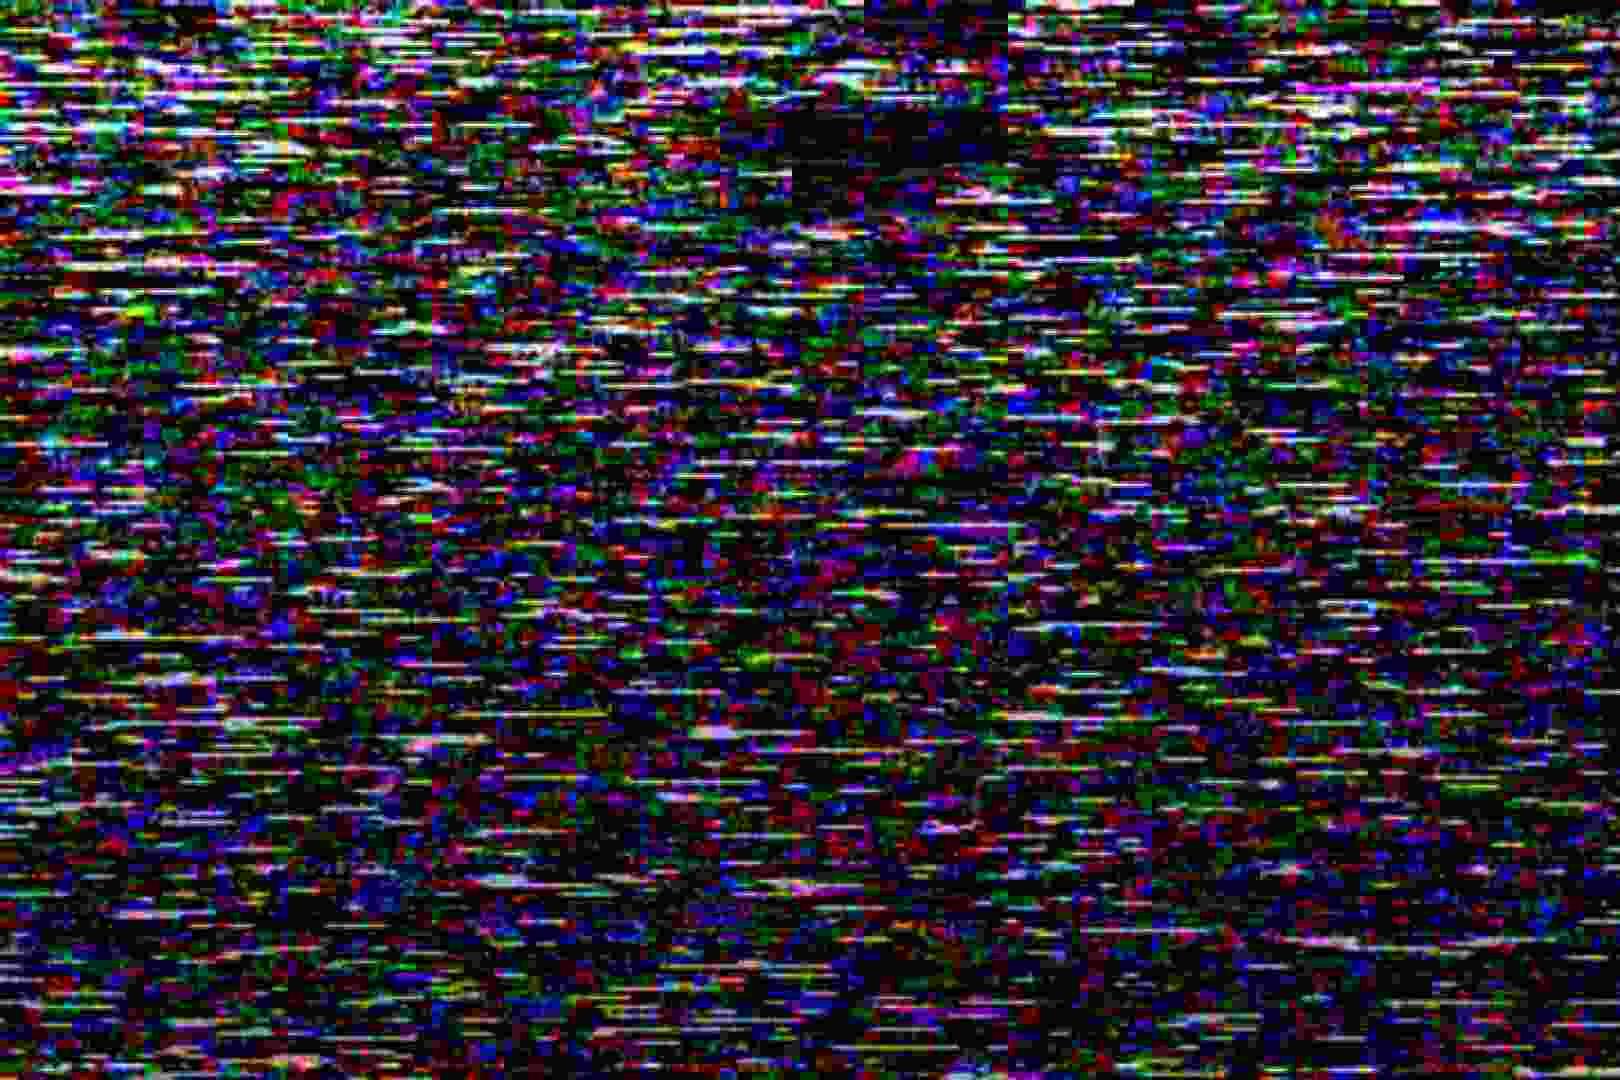 海の家の更衣室 Vol.43 高画質動画 SEX無修正画像 44画像 17